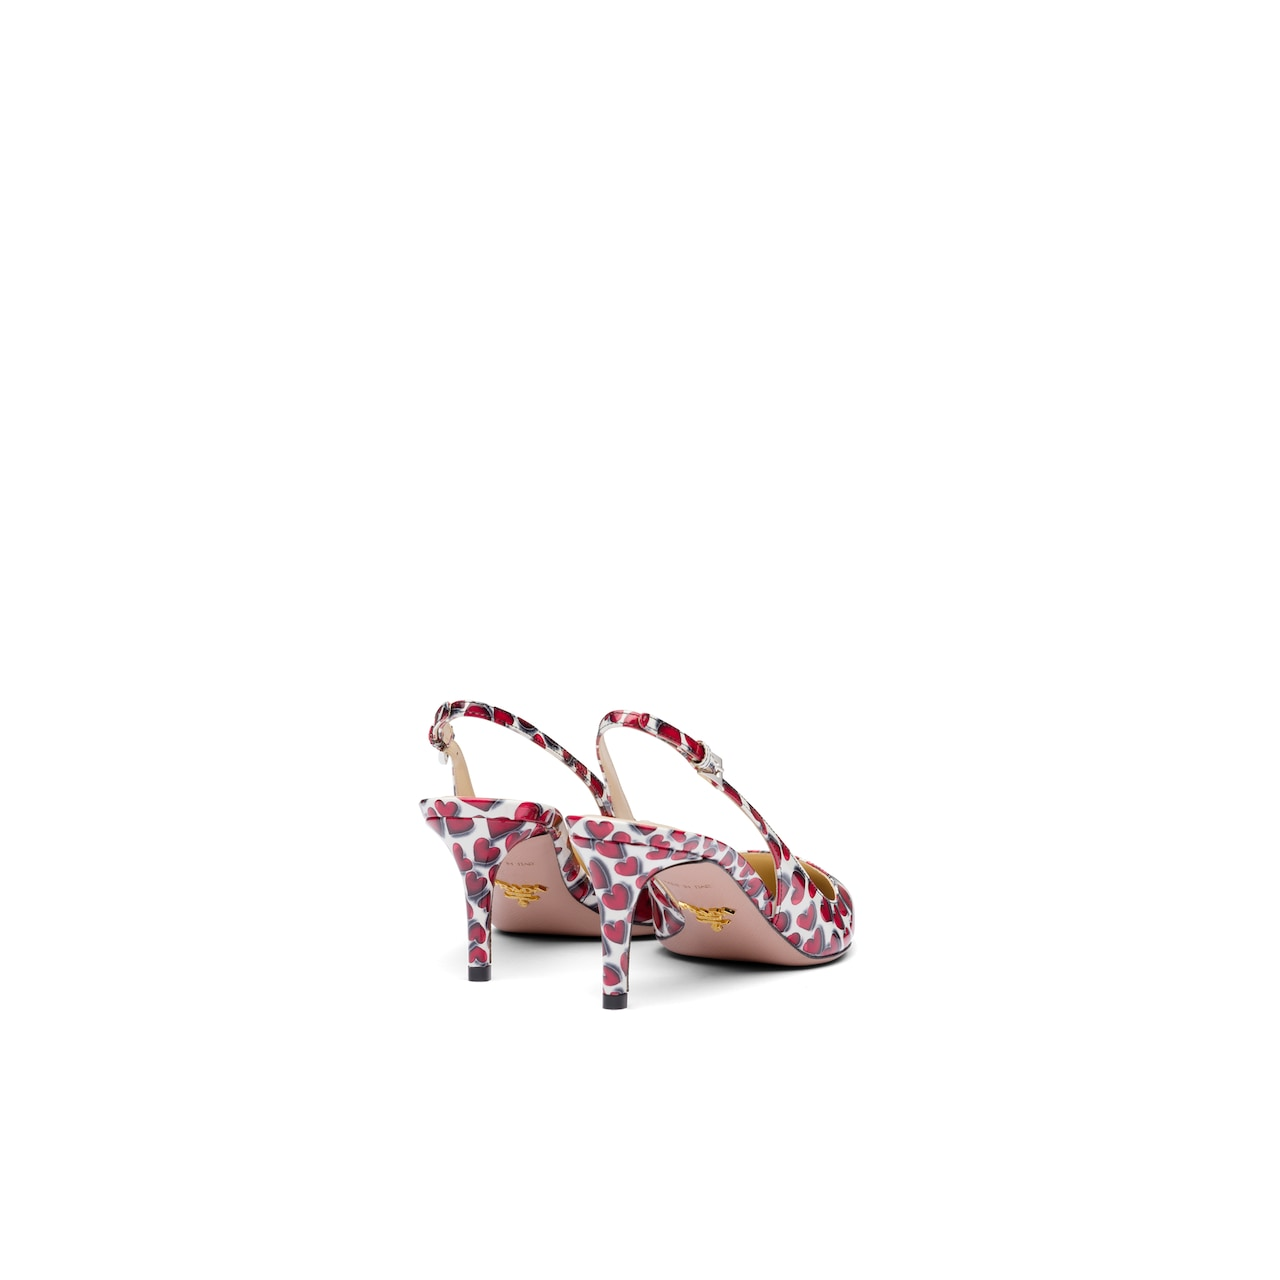 Prada 漆皮高跟鞋 5